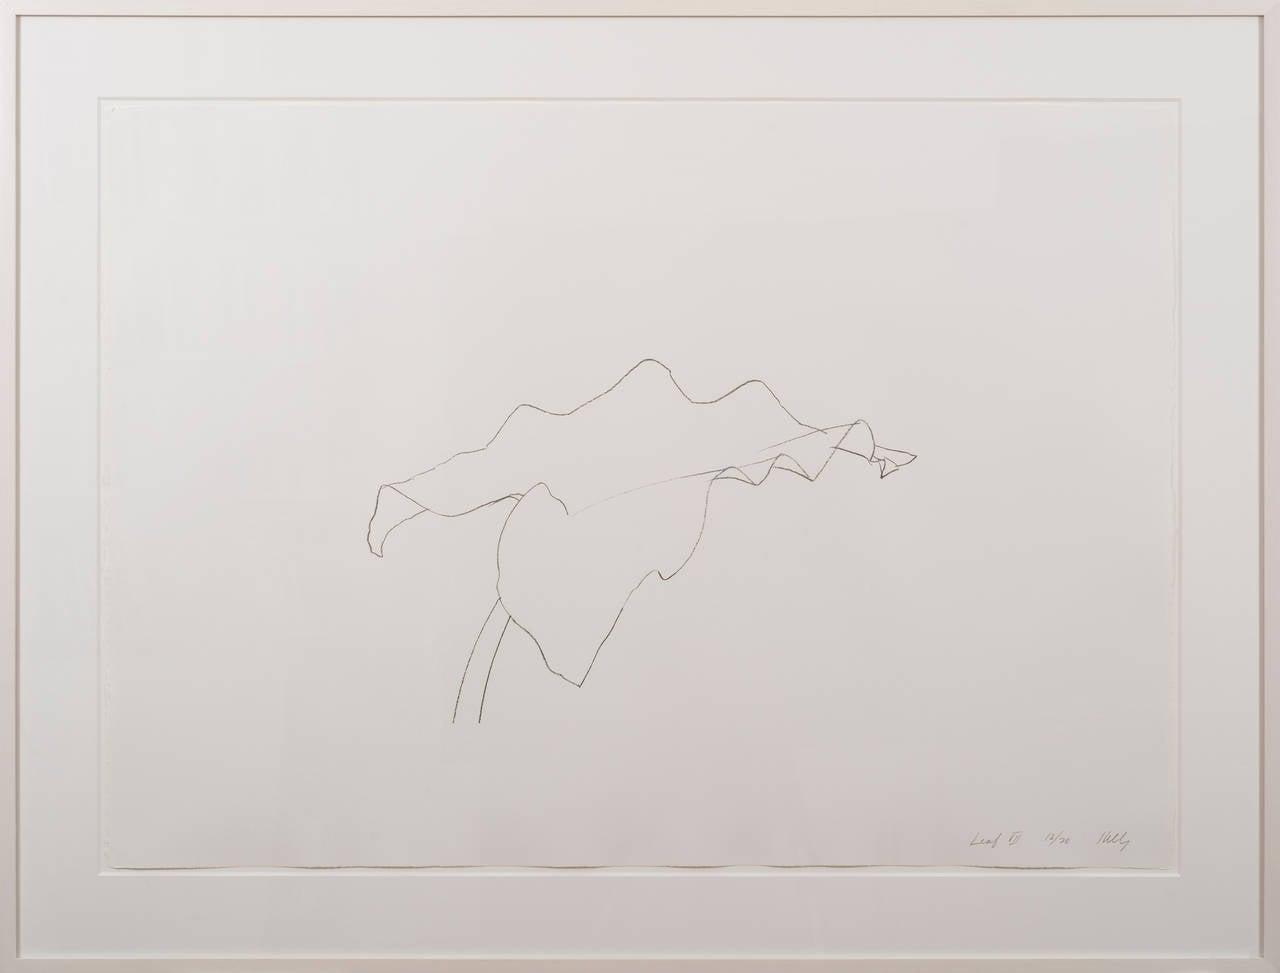 Leaf VII - Contemporary Print by Ellsworth Kelly